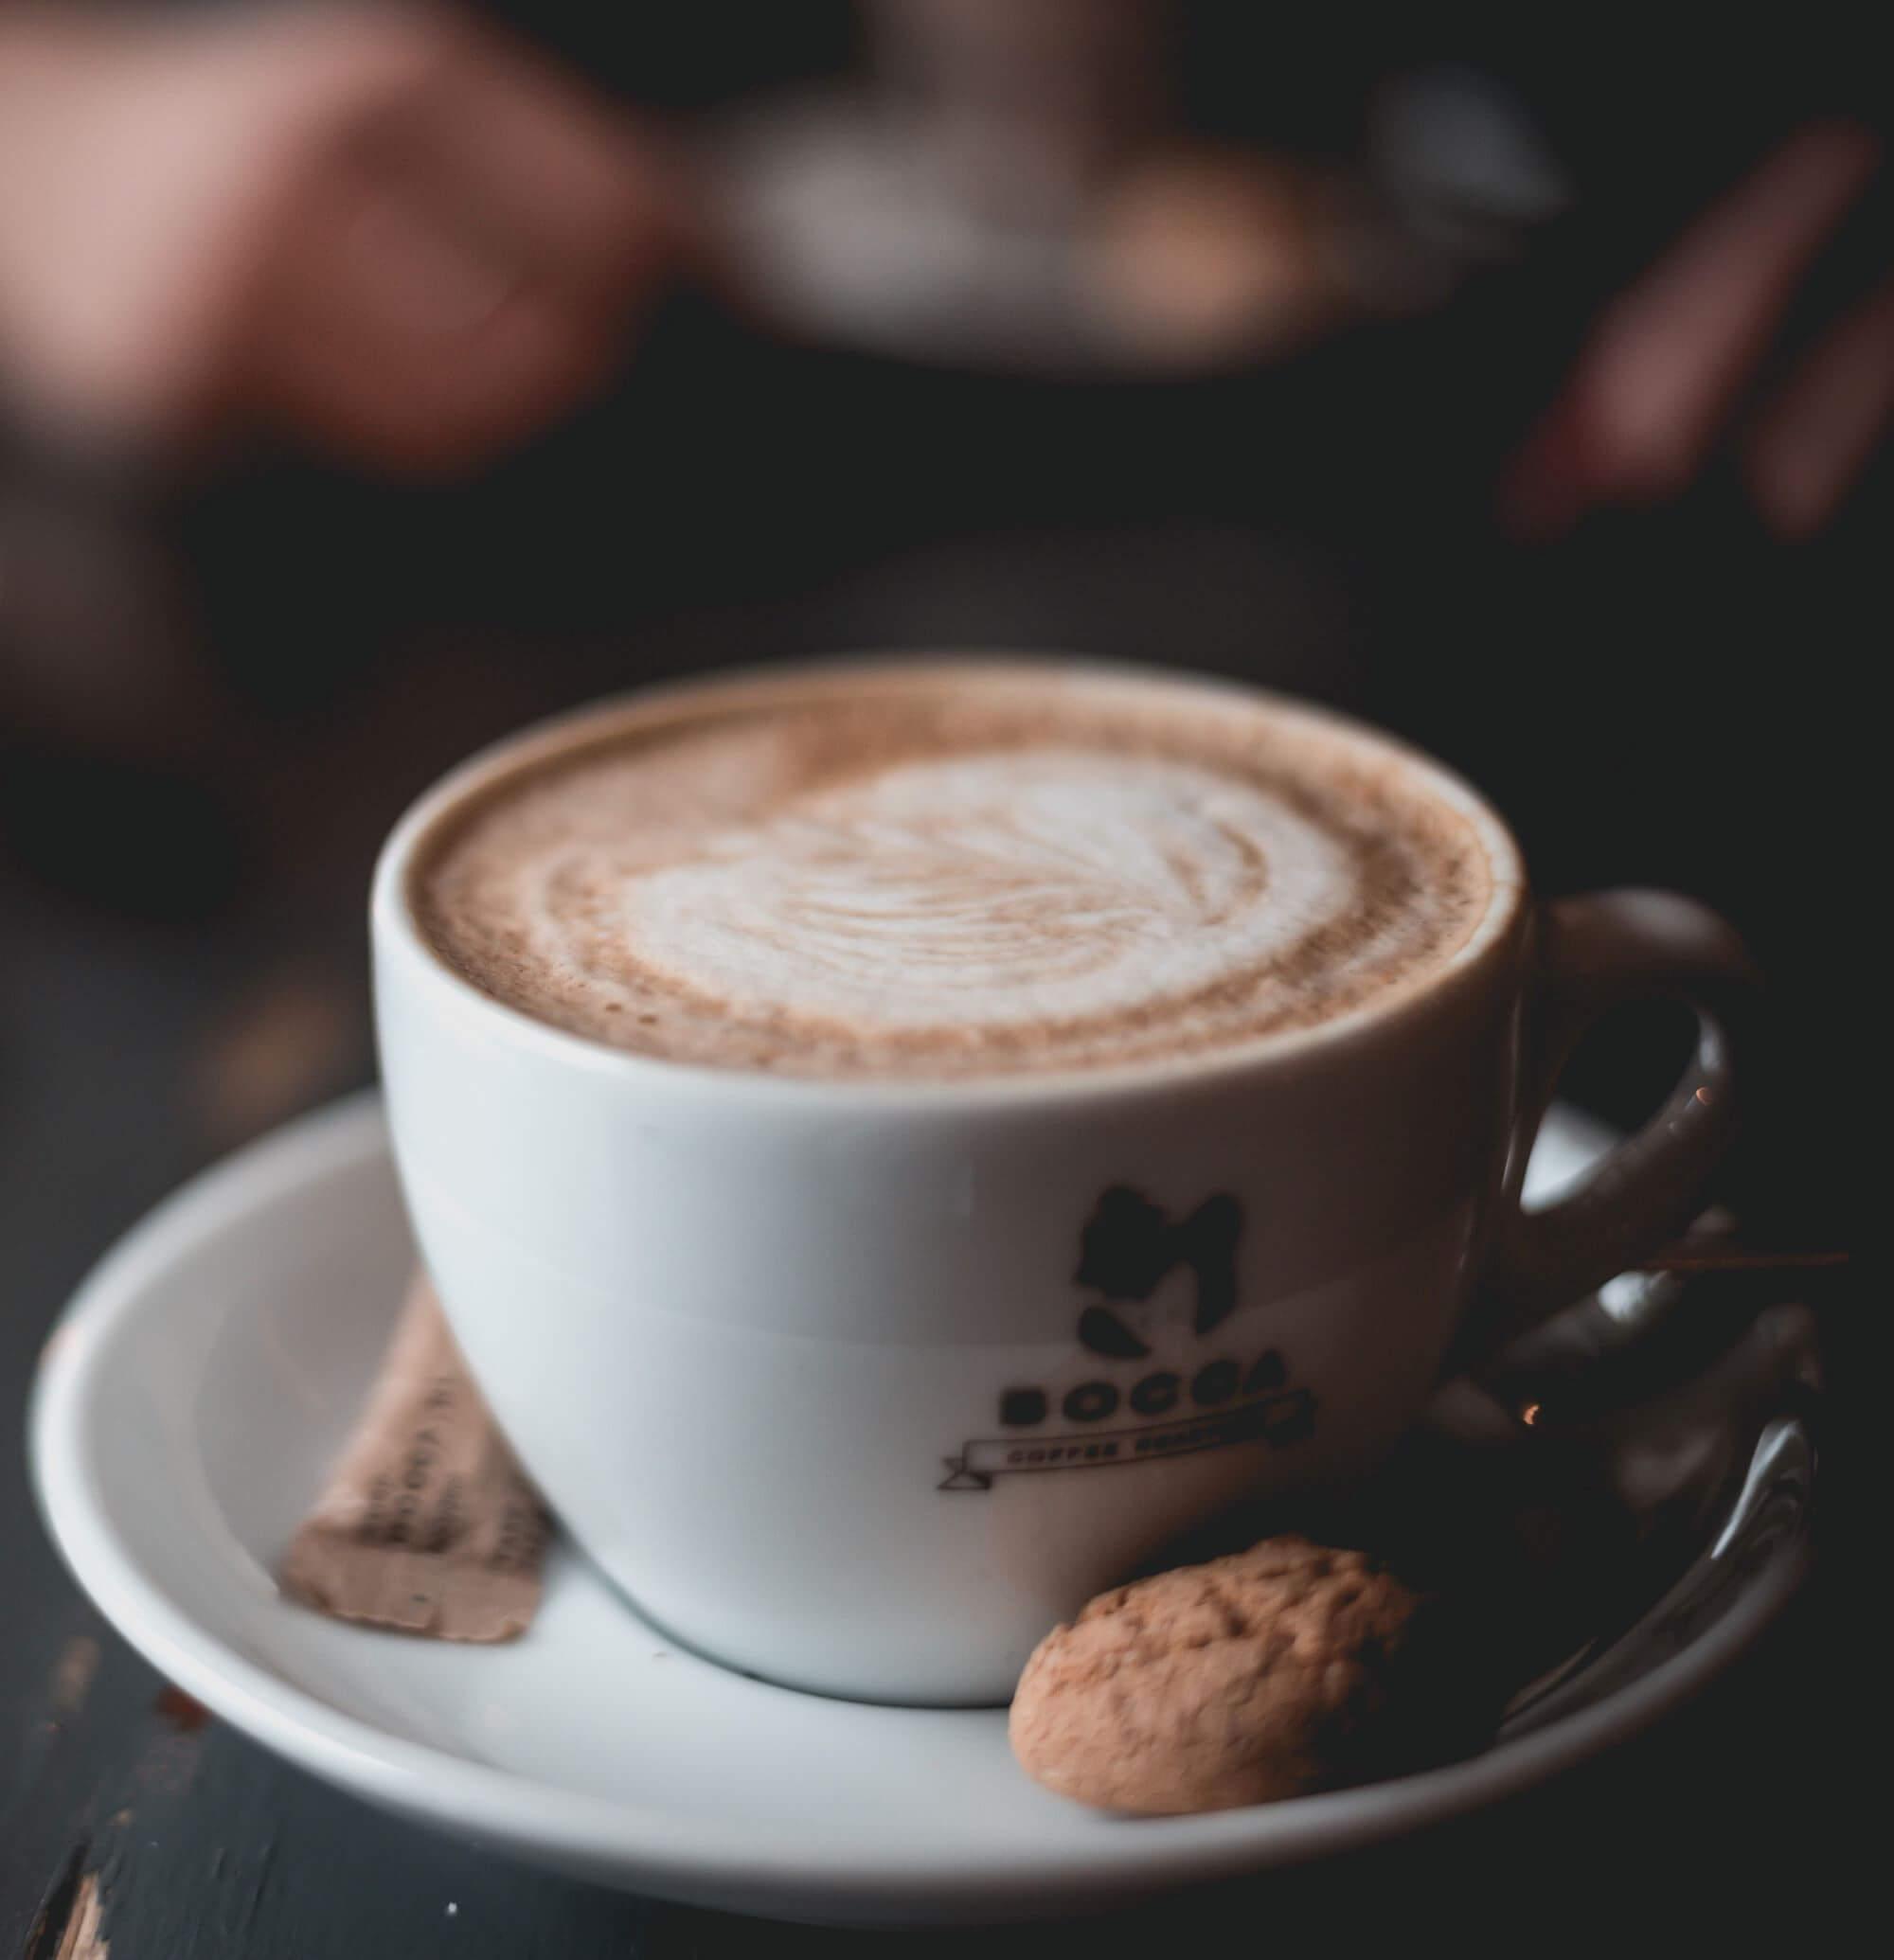 Gebäck von Antica Pasticceria Ambrosiana mit Kaffee